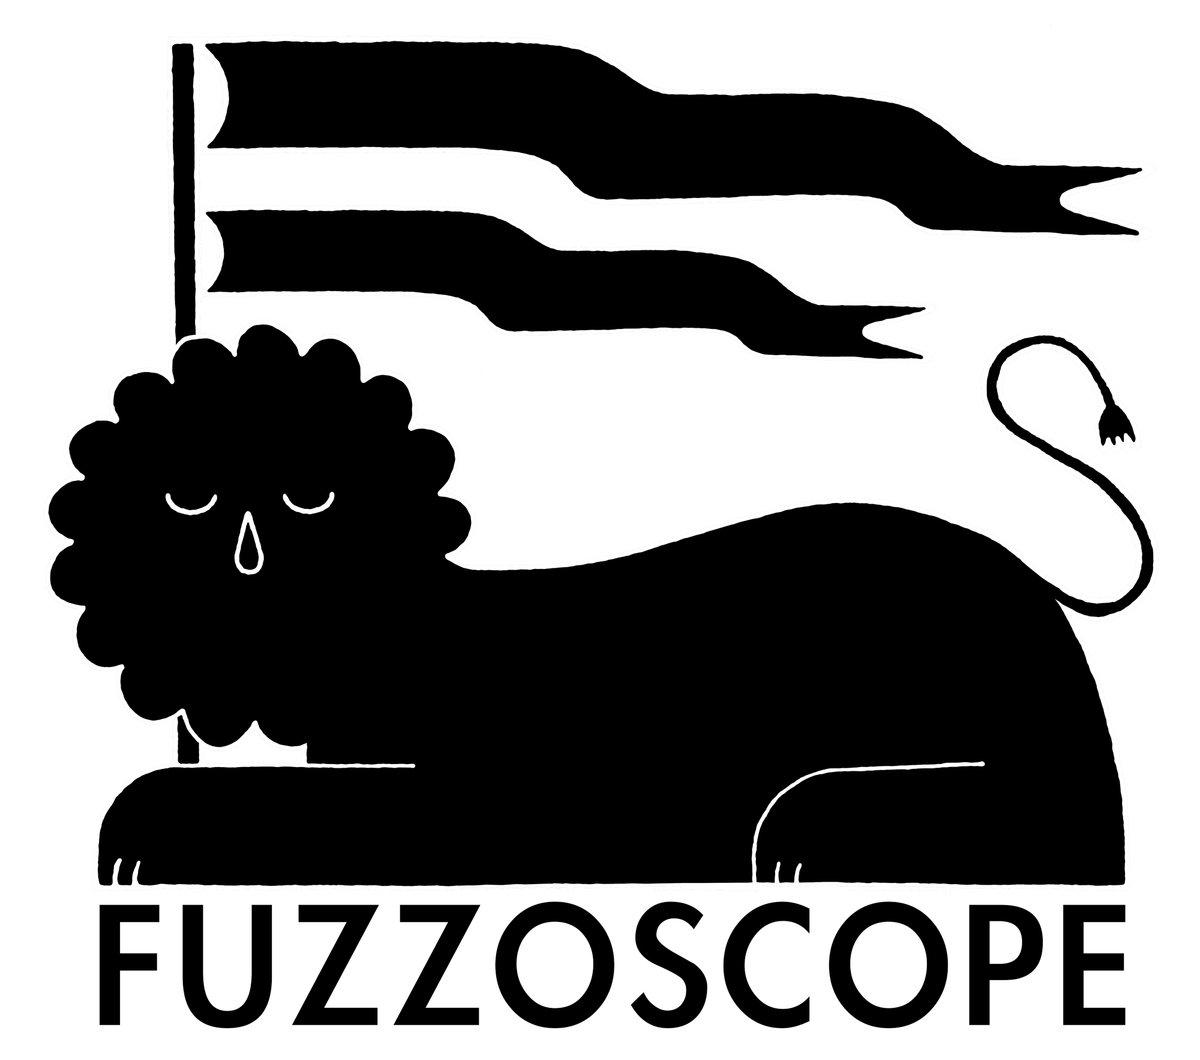 Fuzzoscope